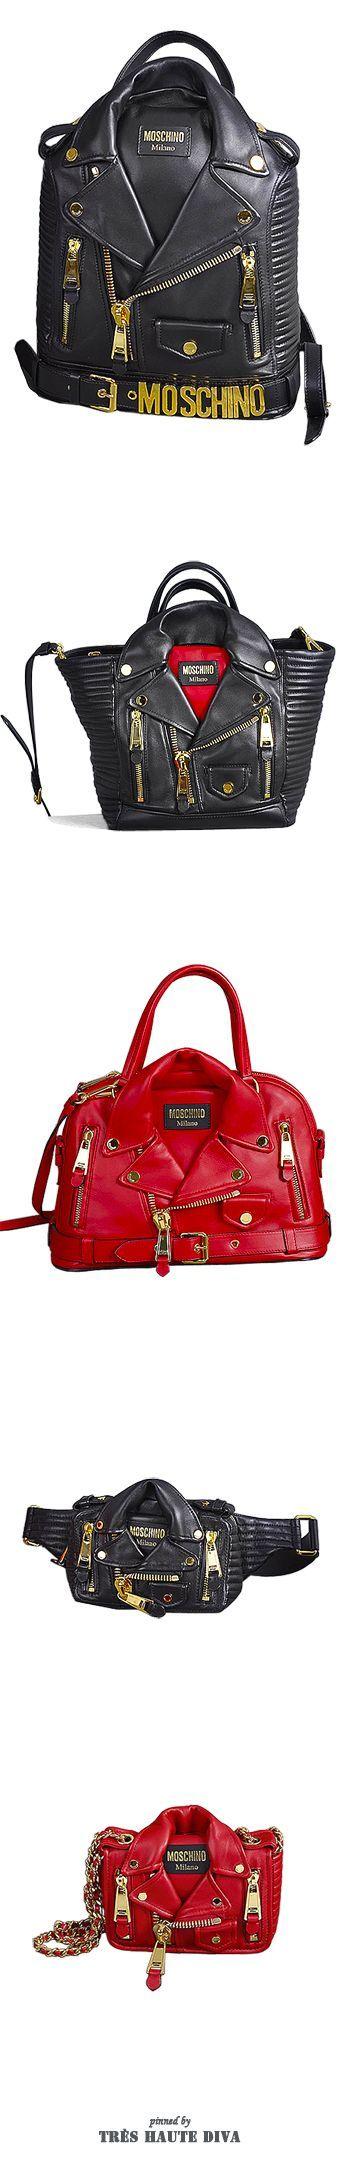 Love this Michael Kors Purse, Cheap Michael Kors Bags Outlet Online Clearance… - designers purses, branded purse sale, designer purses bags *sponsored https://www.pinterest.com/purses_handbags/ https://www.pinterest.com/explore/purse/ https://www.pinterest.com/purses_handbags/radley-handbags/ http://www.burlingtoncoatfactory.com/burlingtoncoatfactory/womens-handbags-60618.aspx